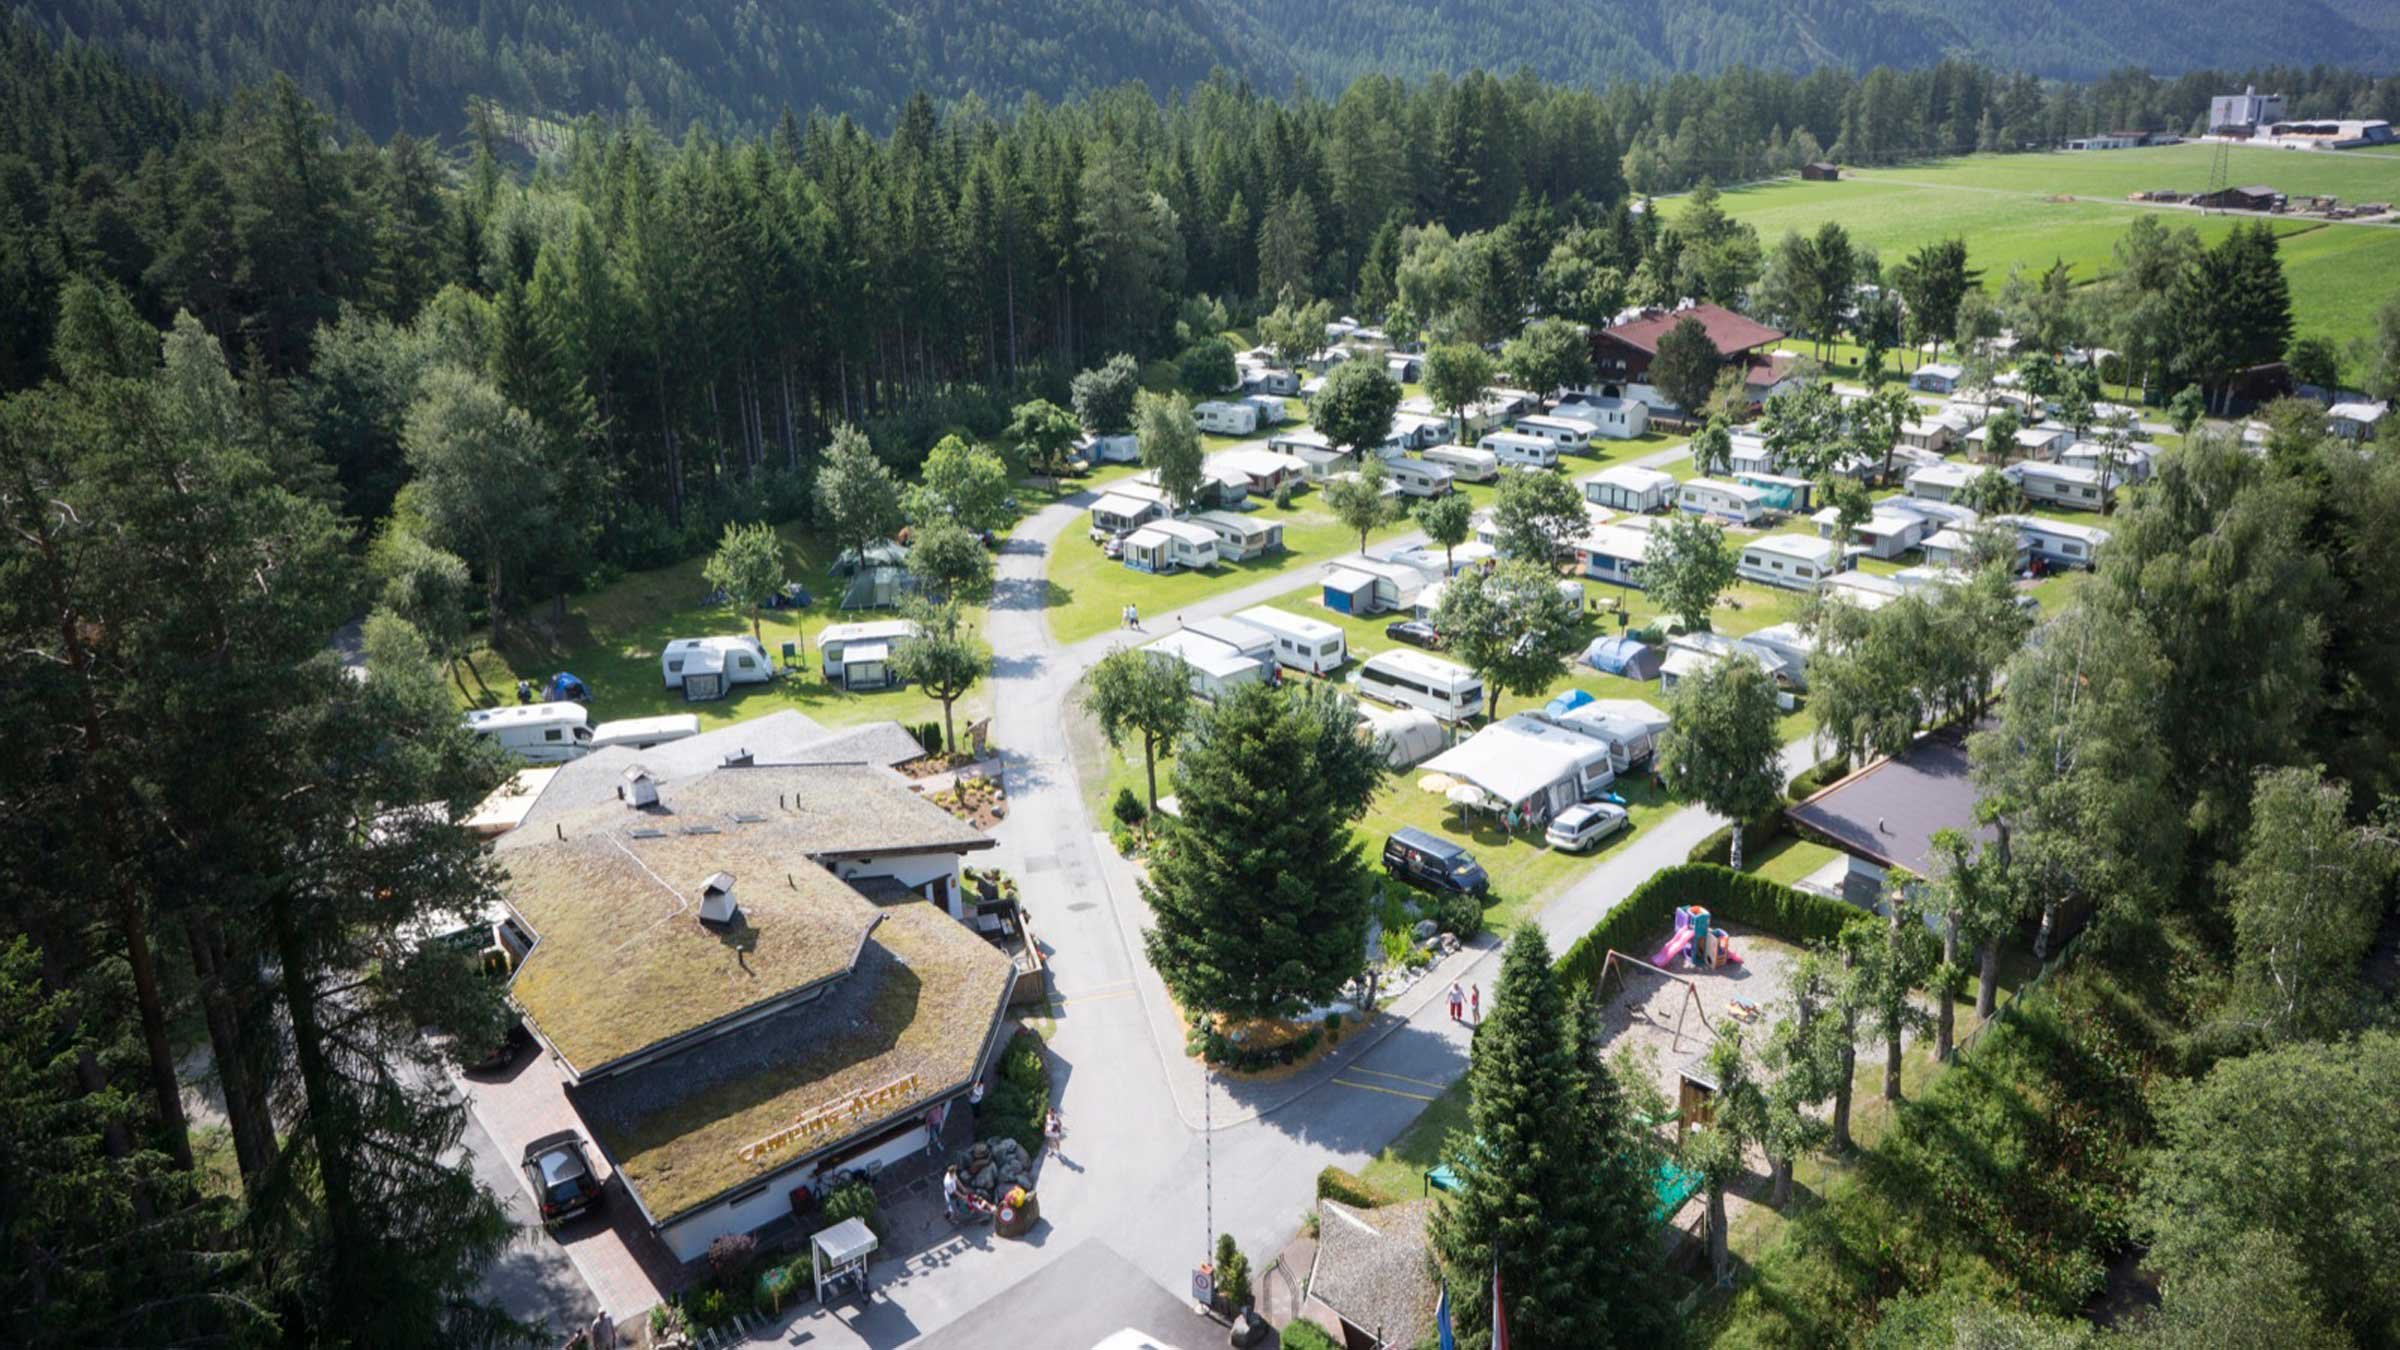 Campingplatz Längenfeld - Camping im Ötztal